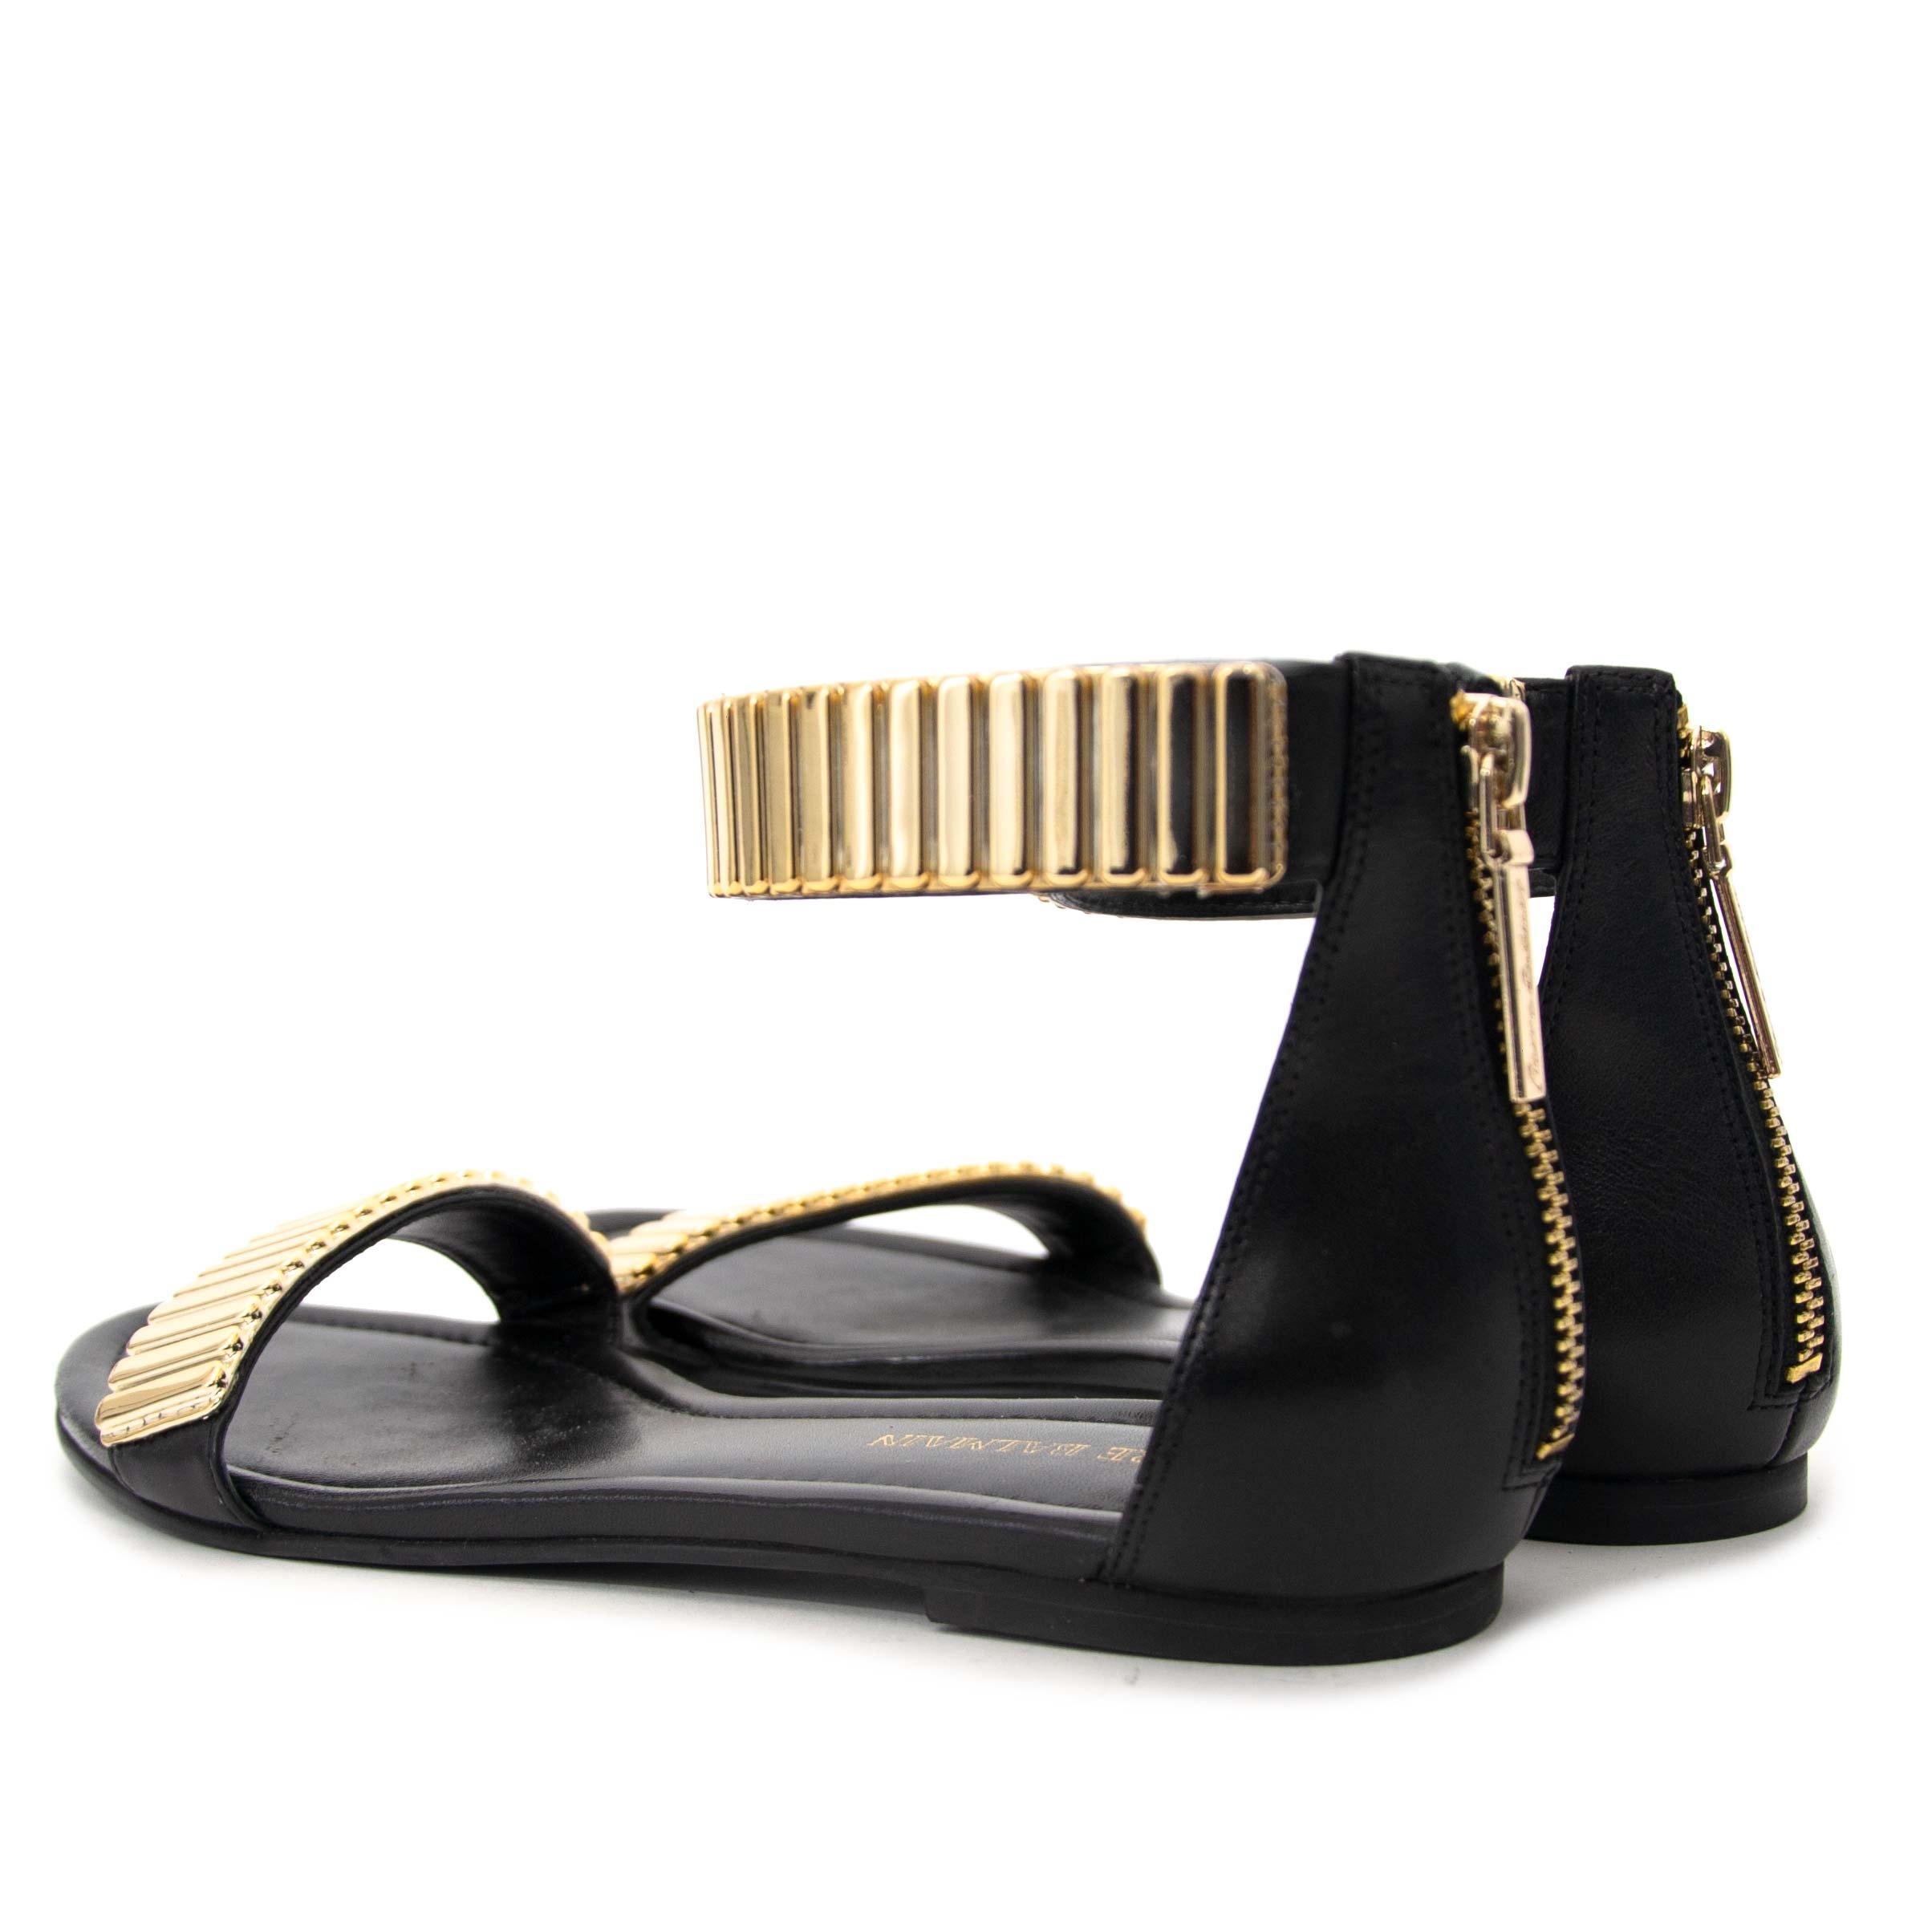 acheter en ligne seconde main Pierre Balmain Metallic Embellished Leather Sandals - Size 37